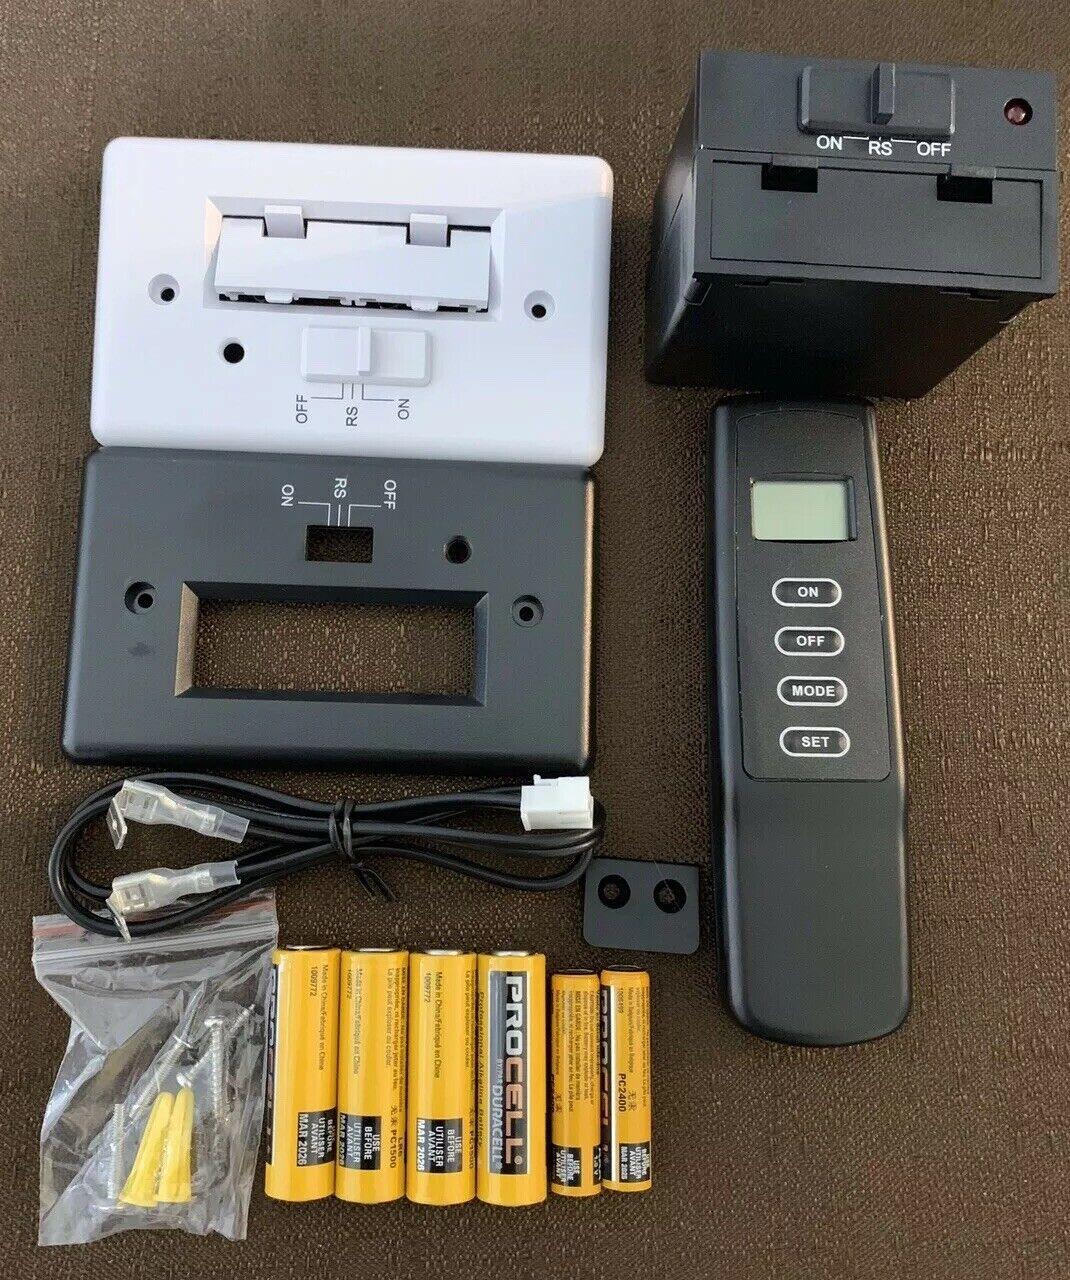 2 Pcs Pull Recoil Starter For Stihl Fs120 Fs200 Fs250 Manual Guide